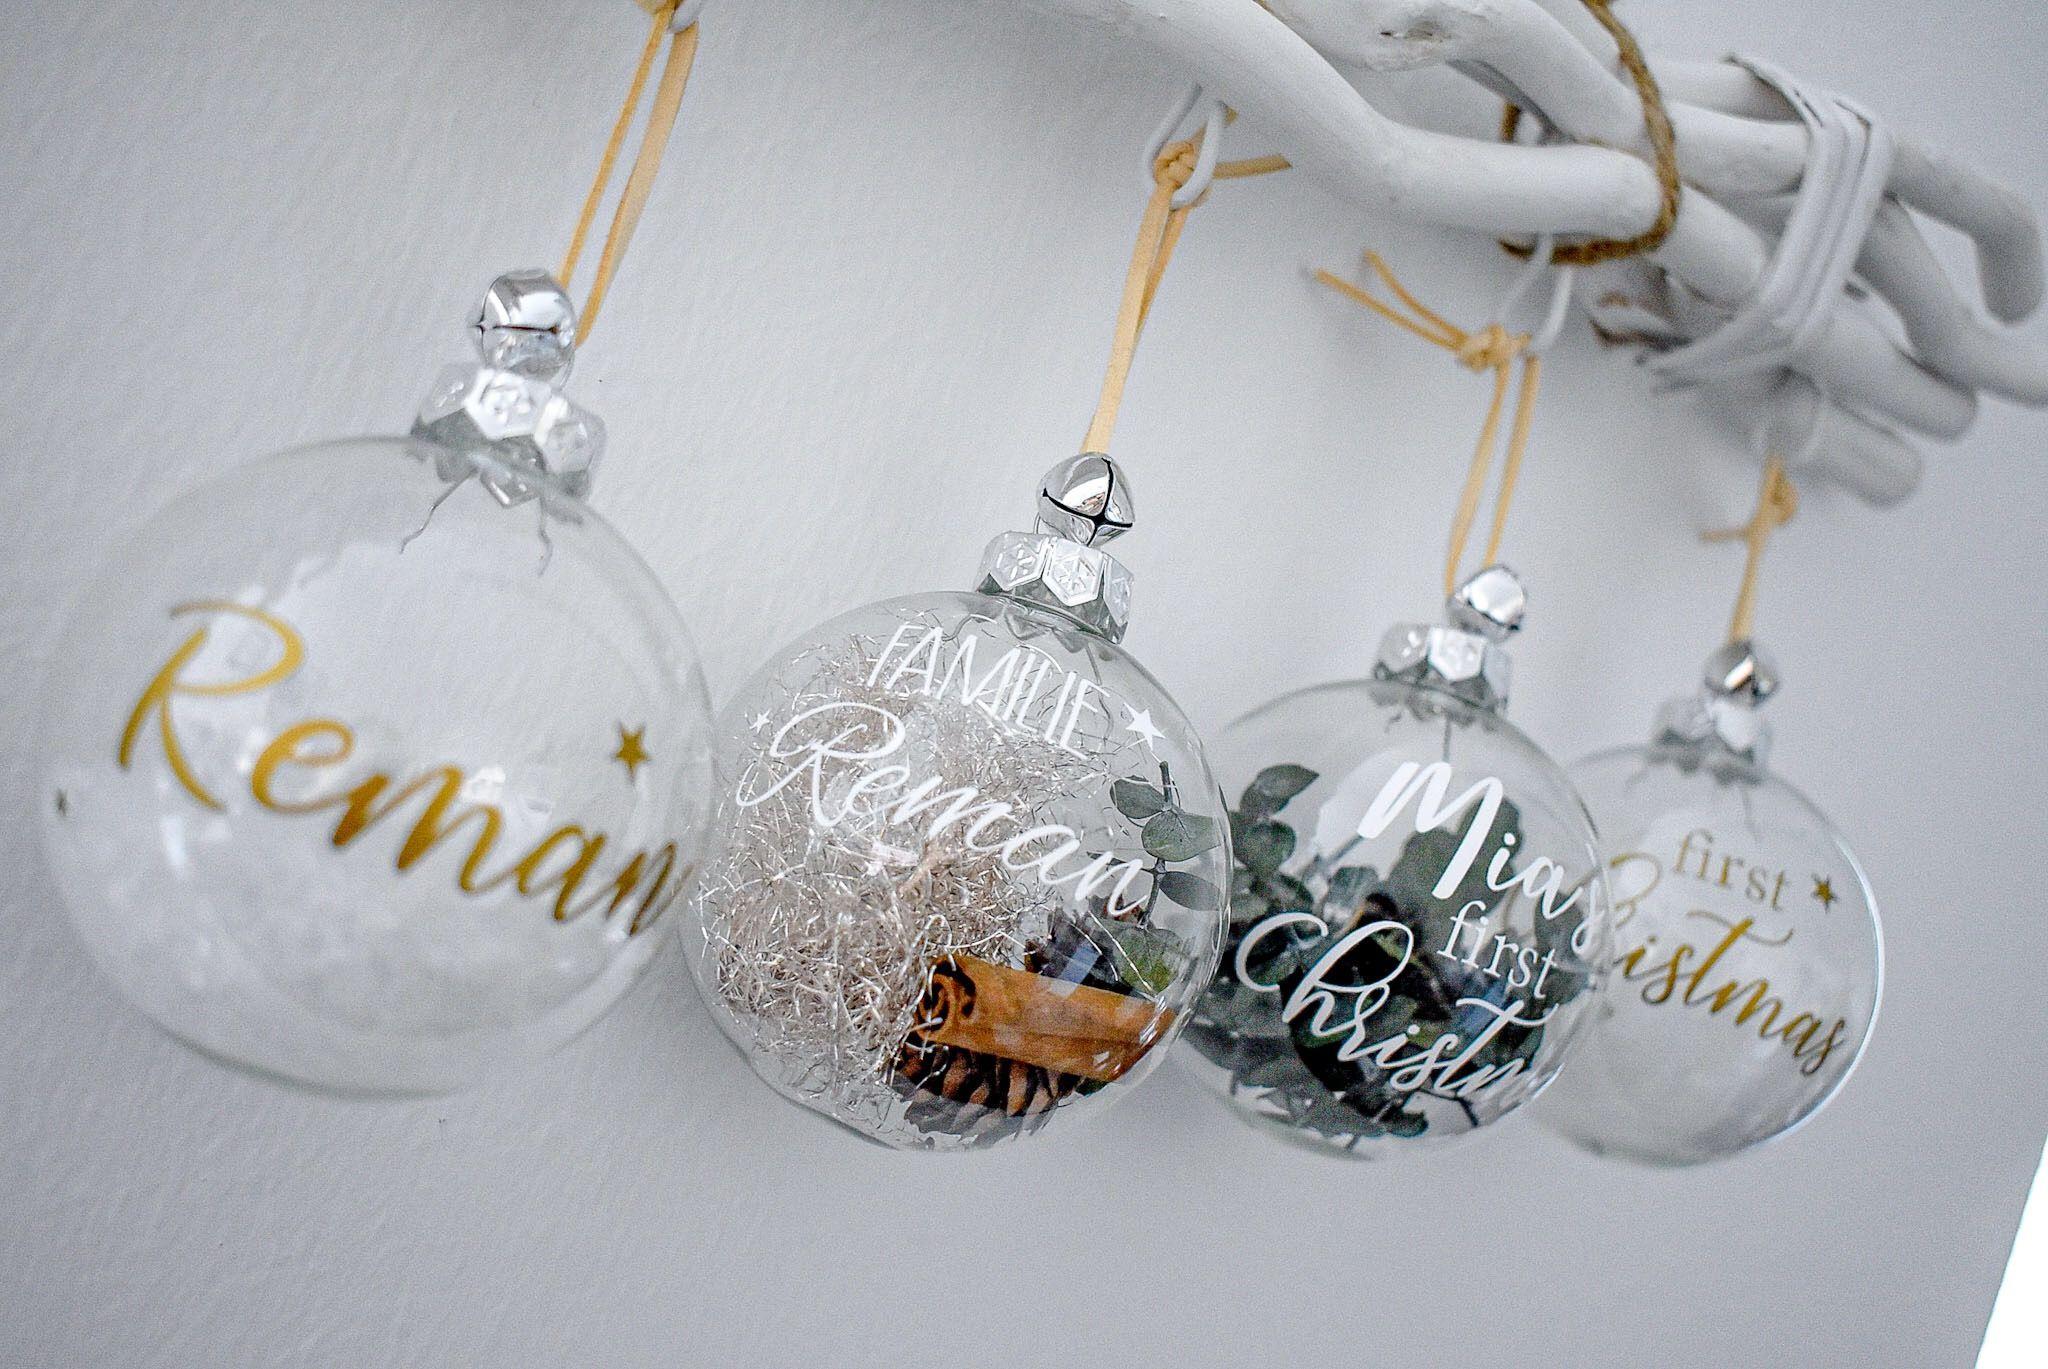 Personalisierte Christbaumkugeln  #weihnachtsdekoimglasmitkugeln